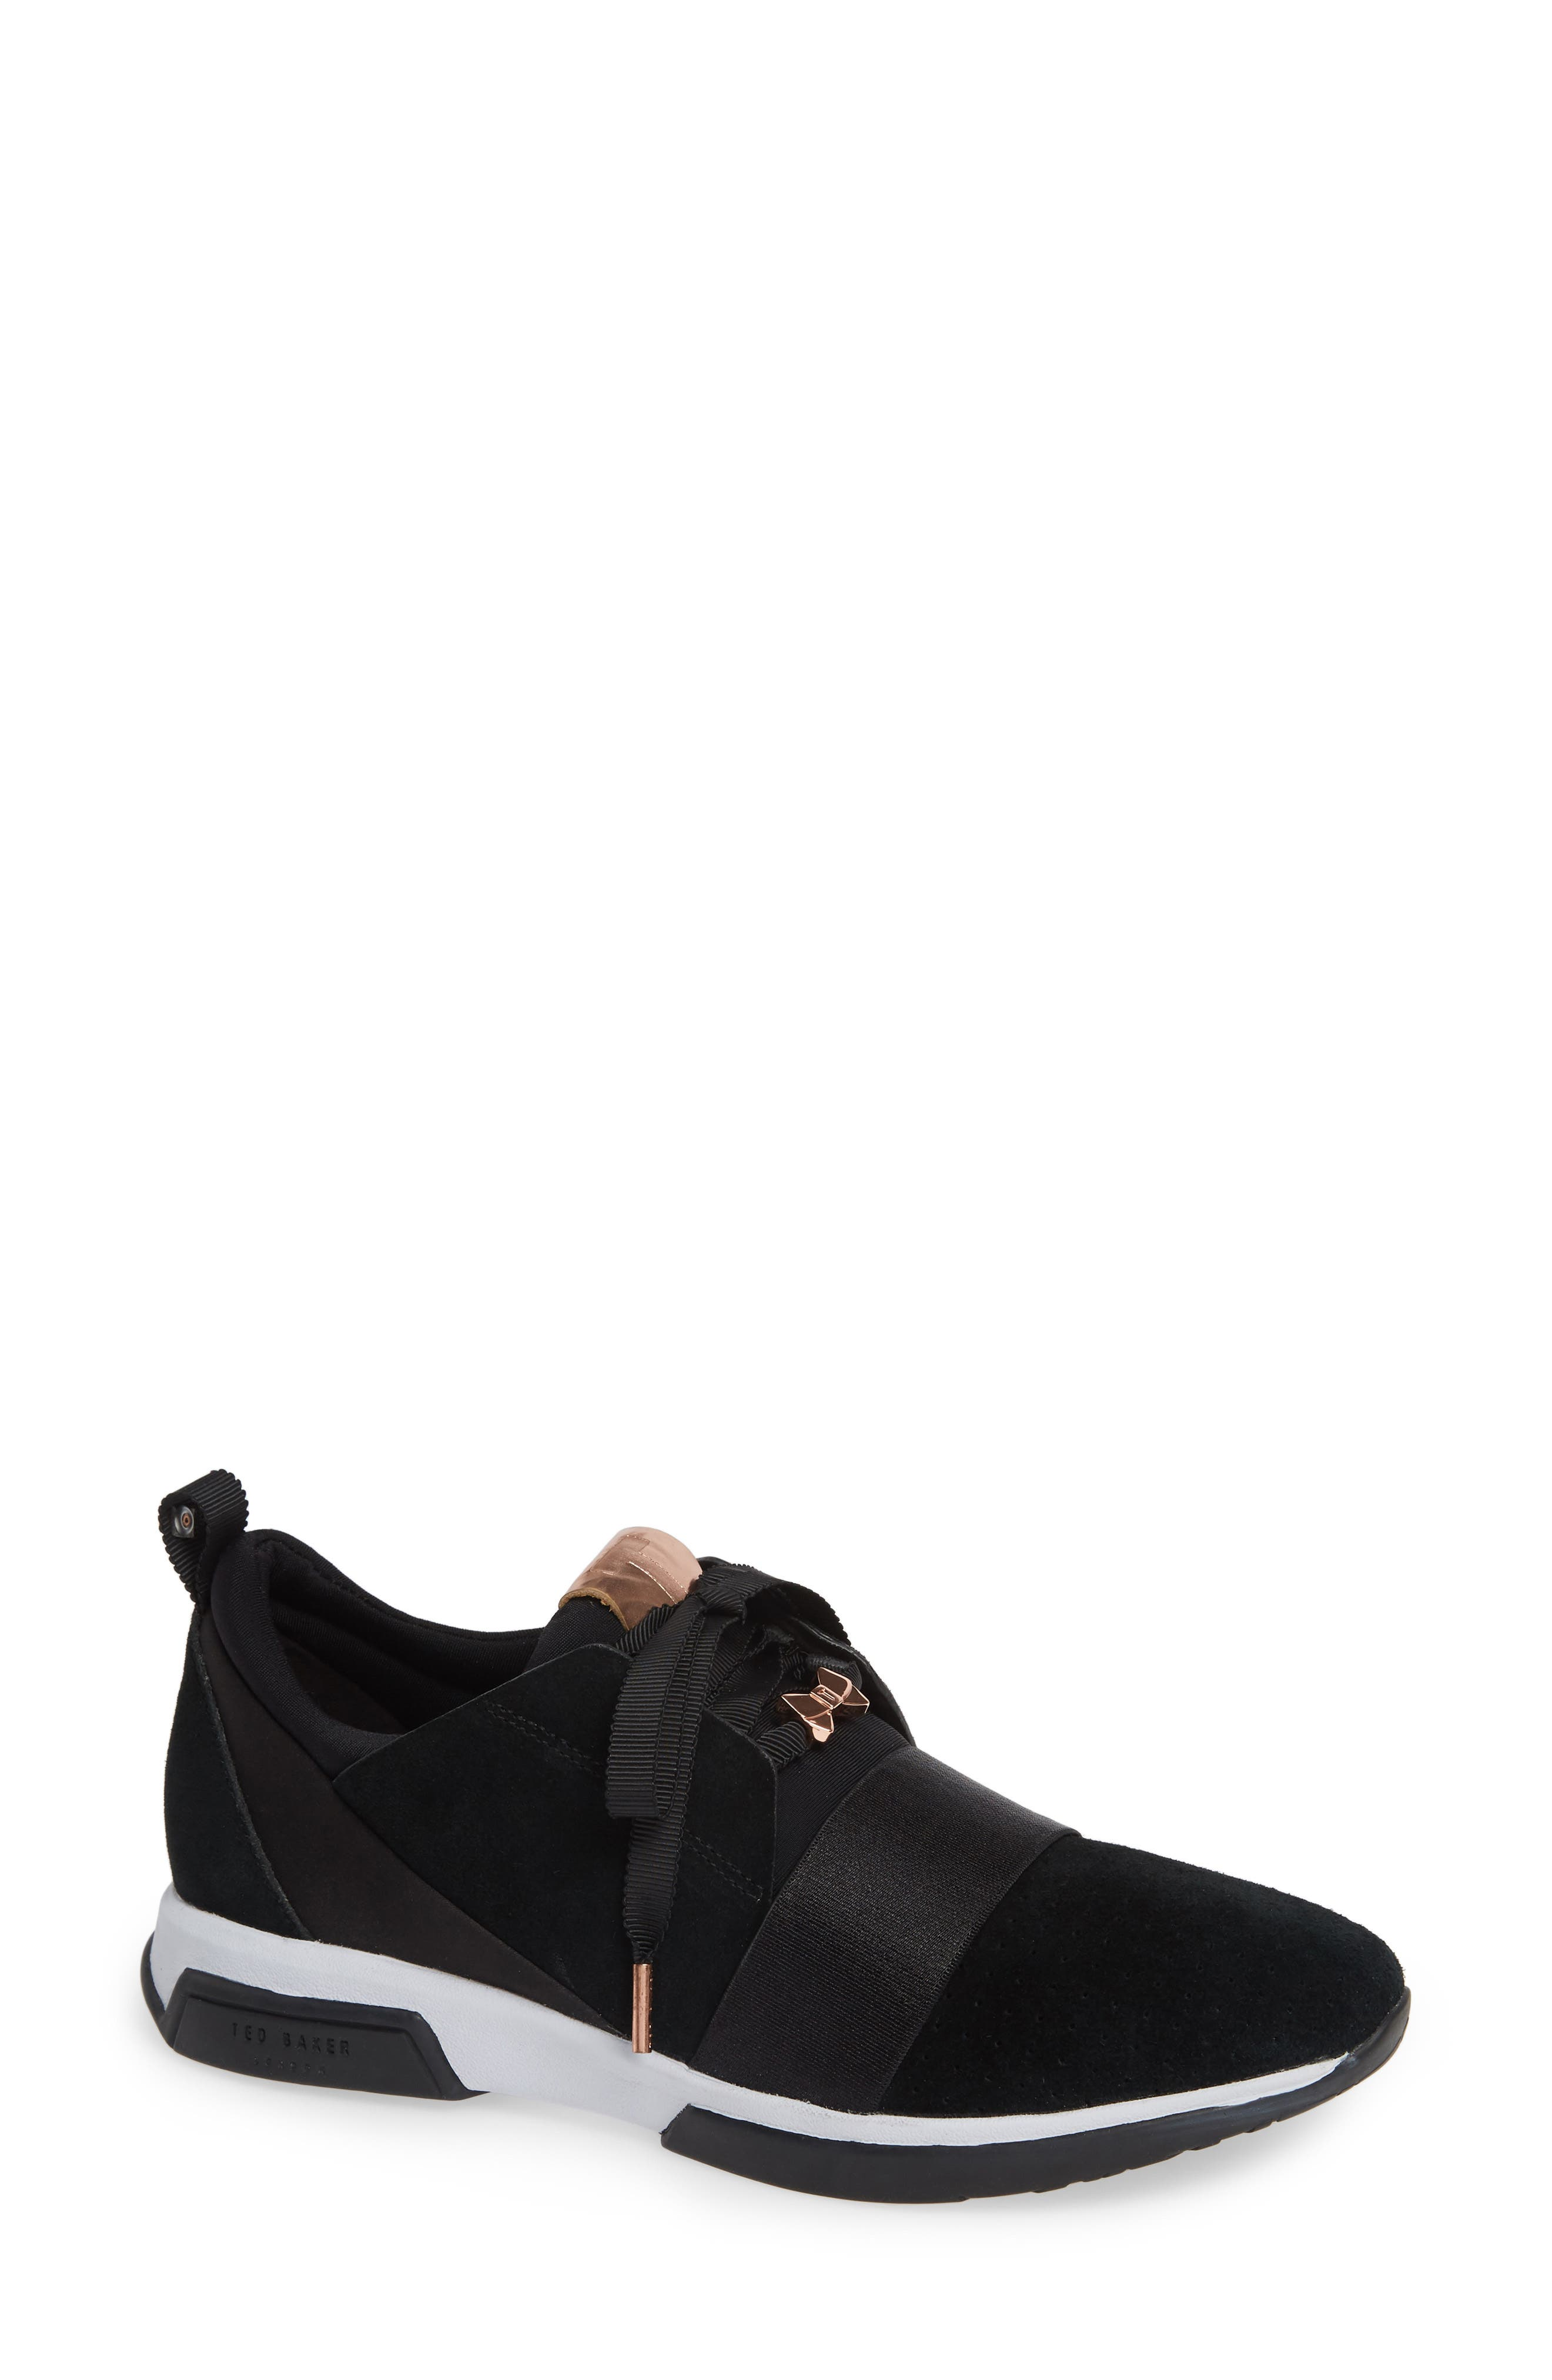 Ted Baker London Cepap Sneaker - Black